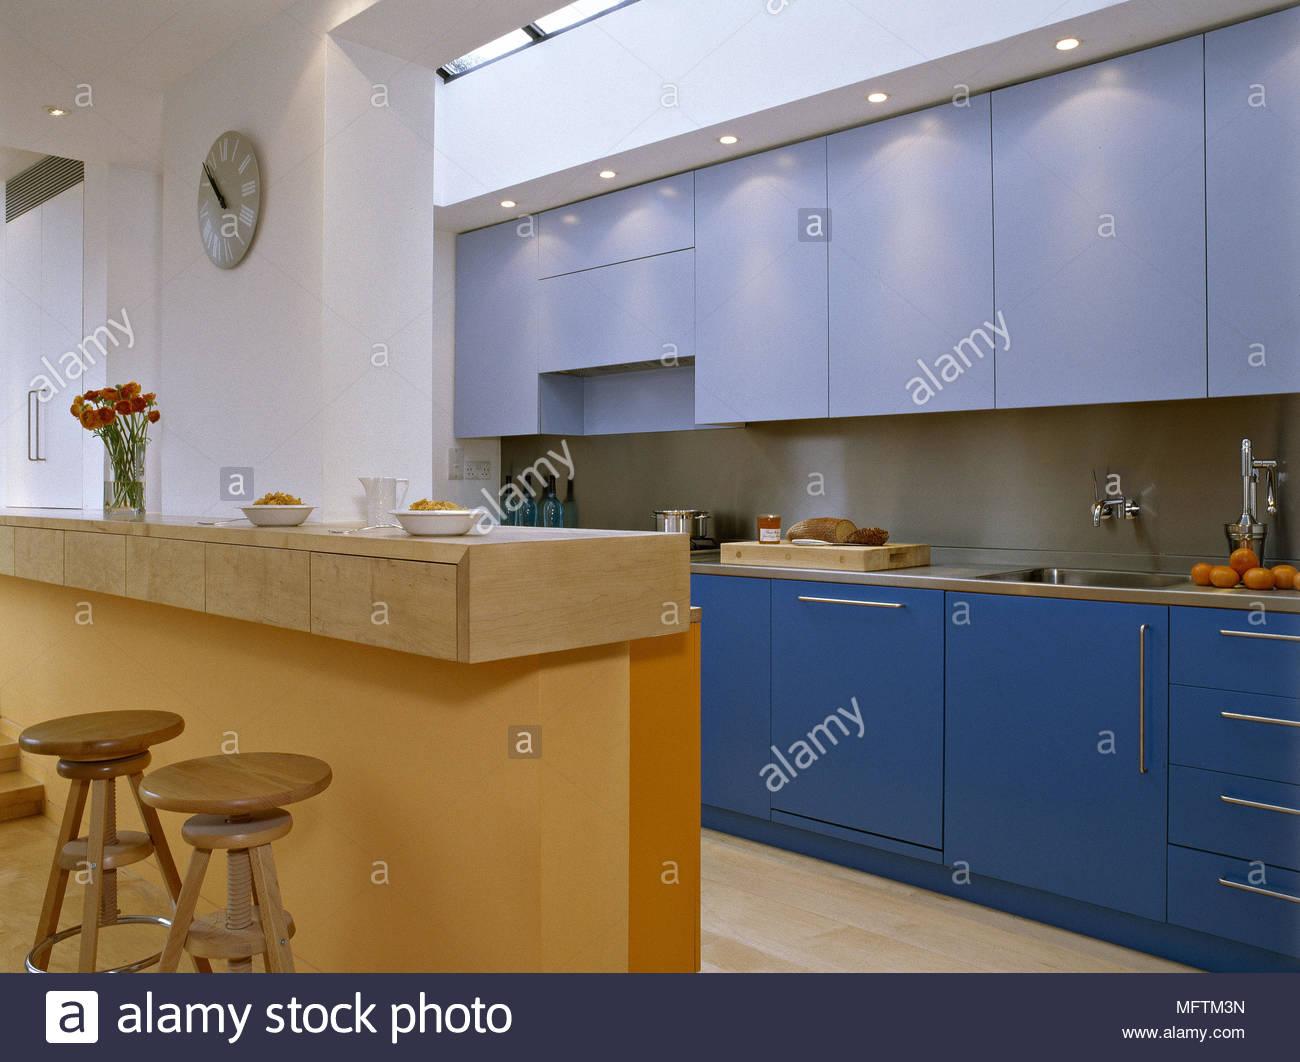 Una cucina moderna con armadi blu breakfast bar e sgabelli in legno